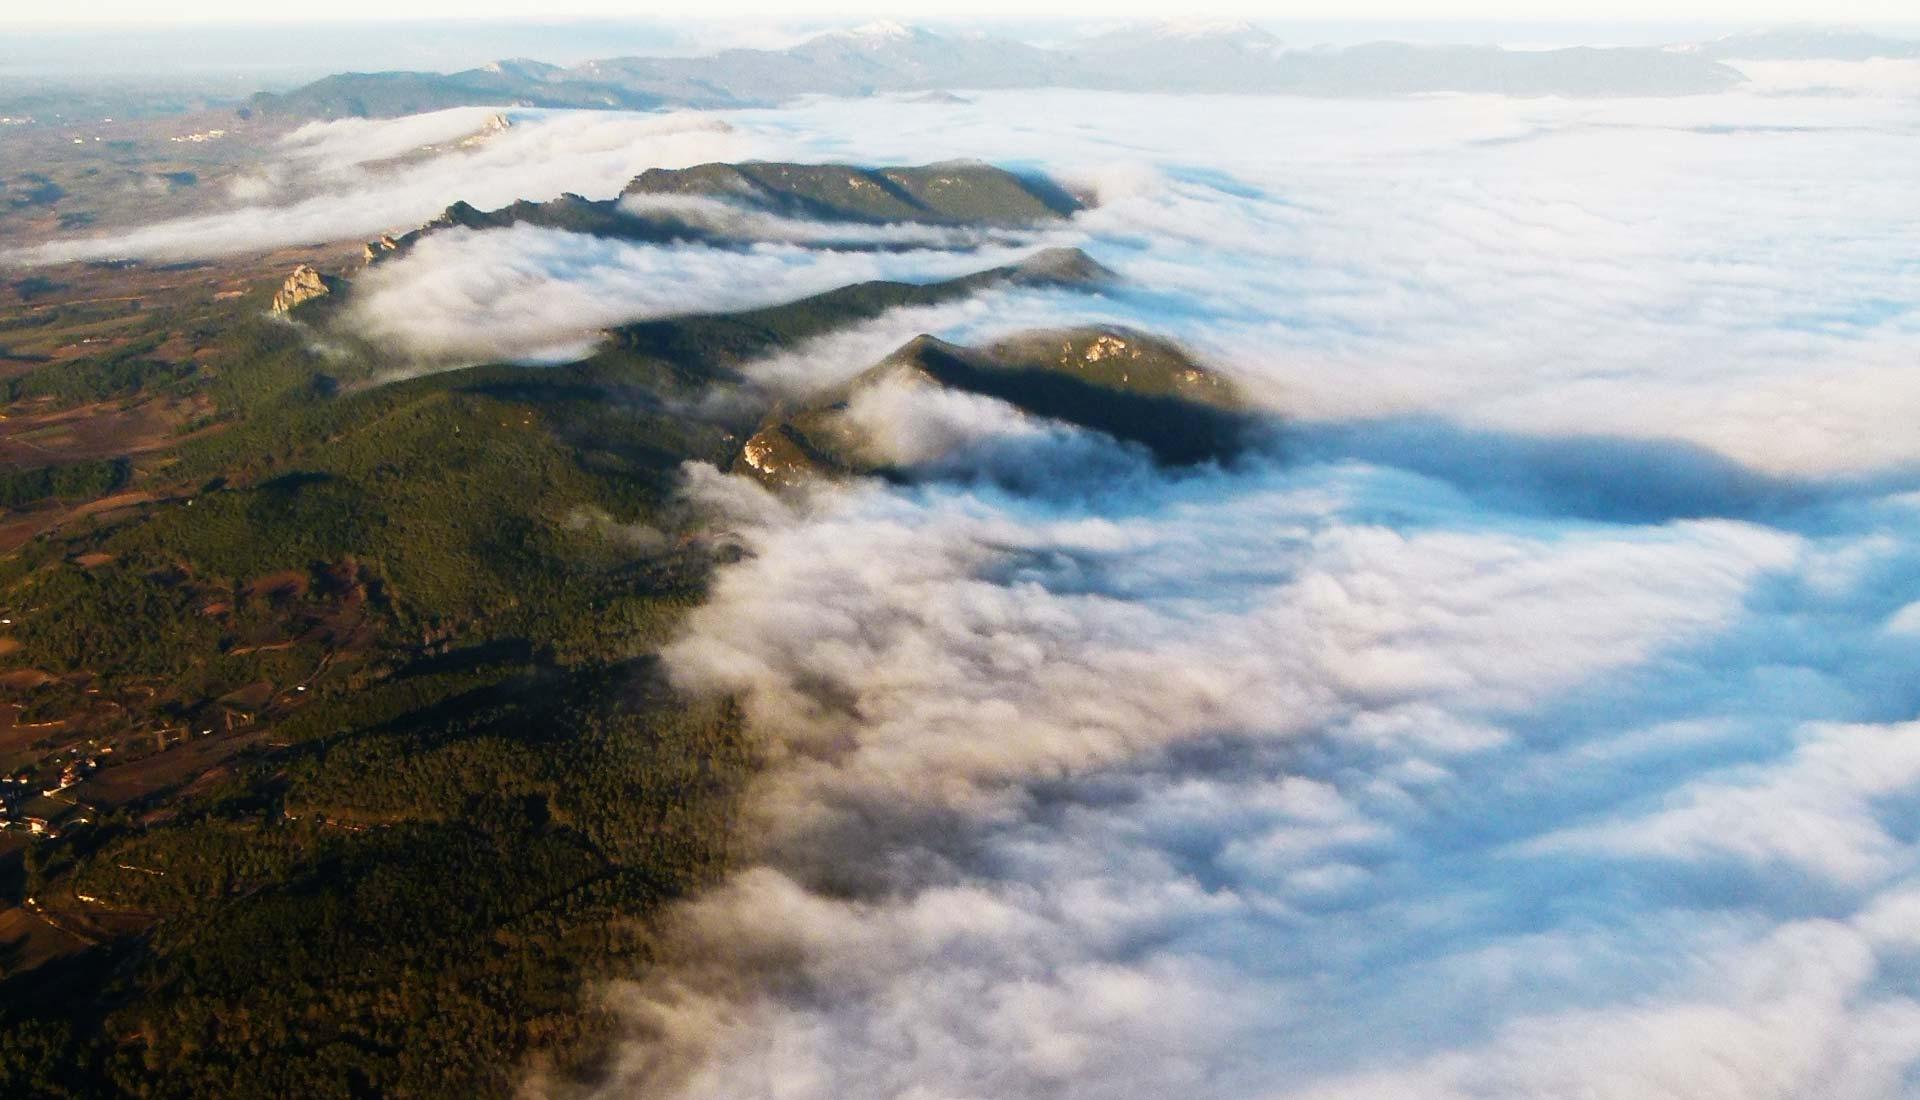 vuelo en globo arcoiris 55 min